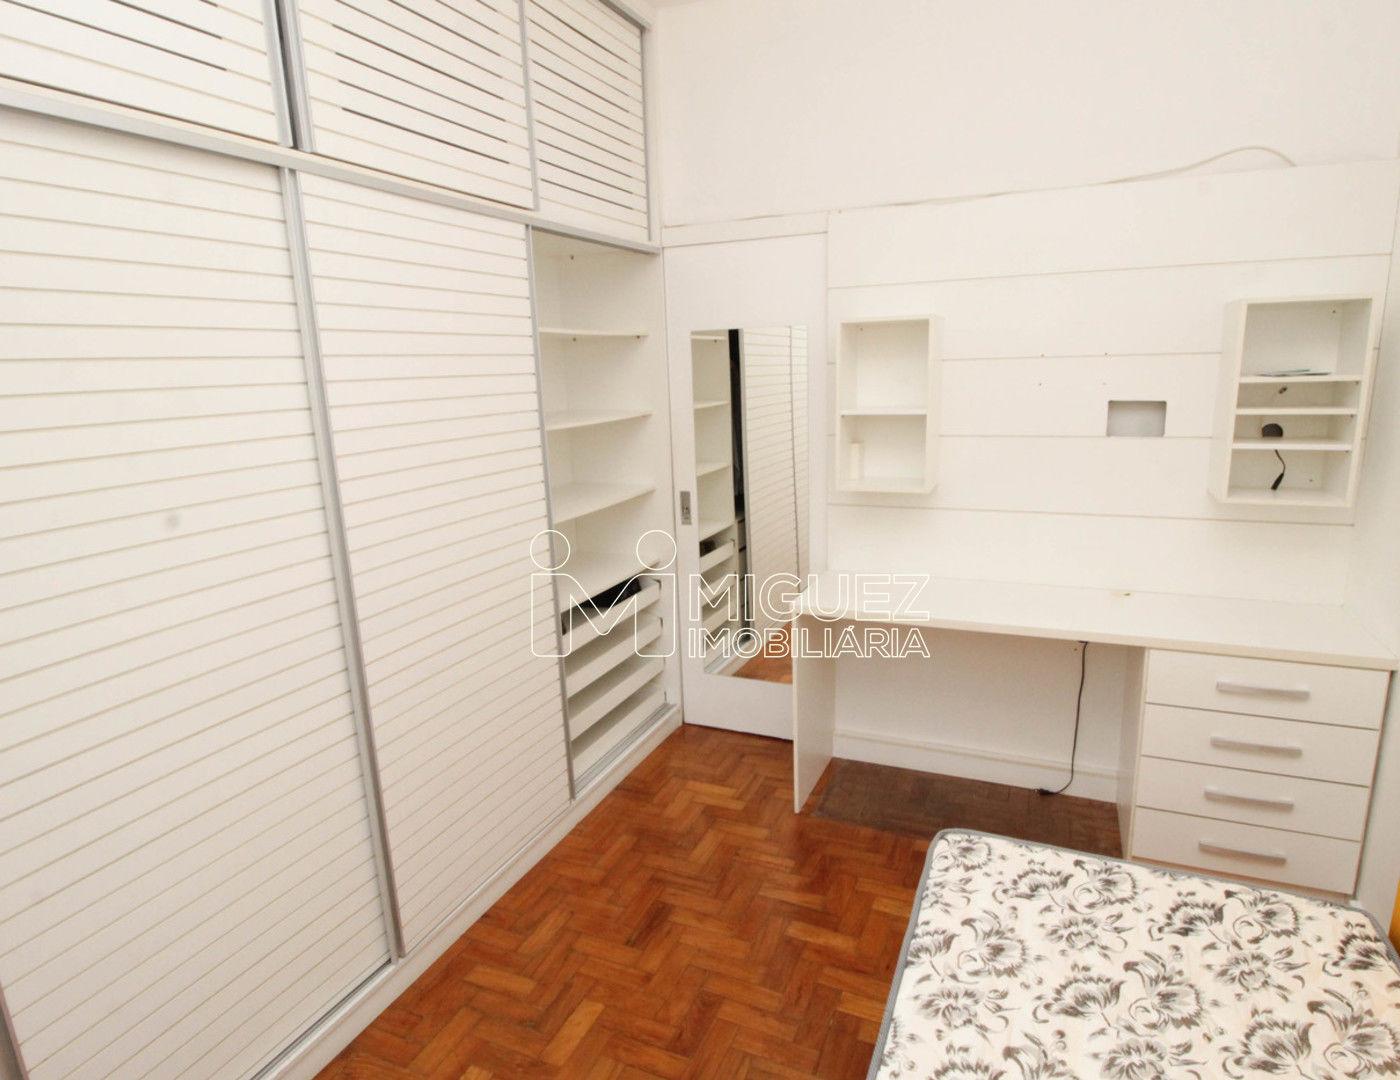 Apartamento, , Rua Uruguai - Tijuca , Rio de janeiro